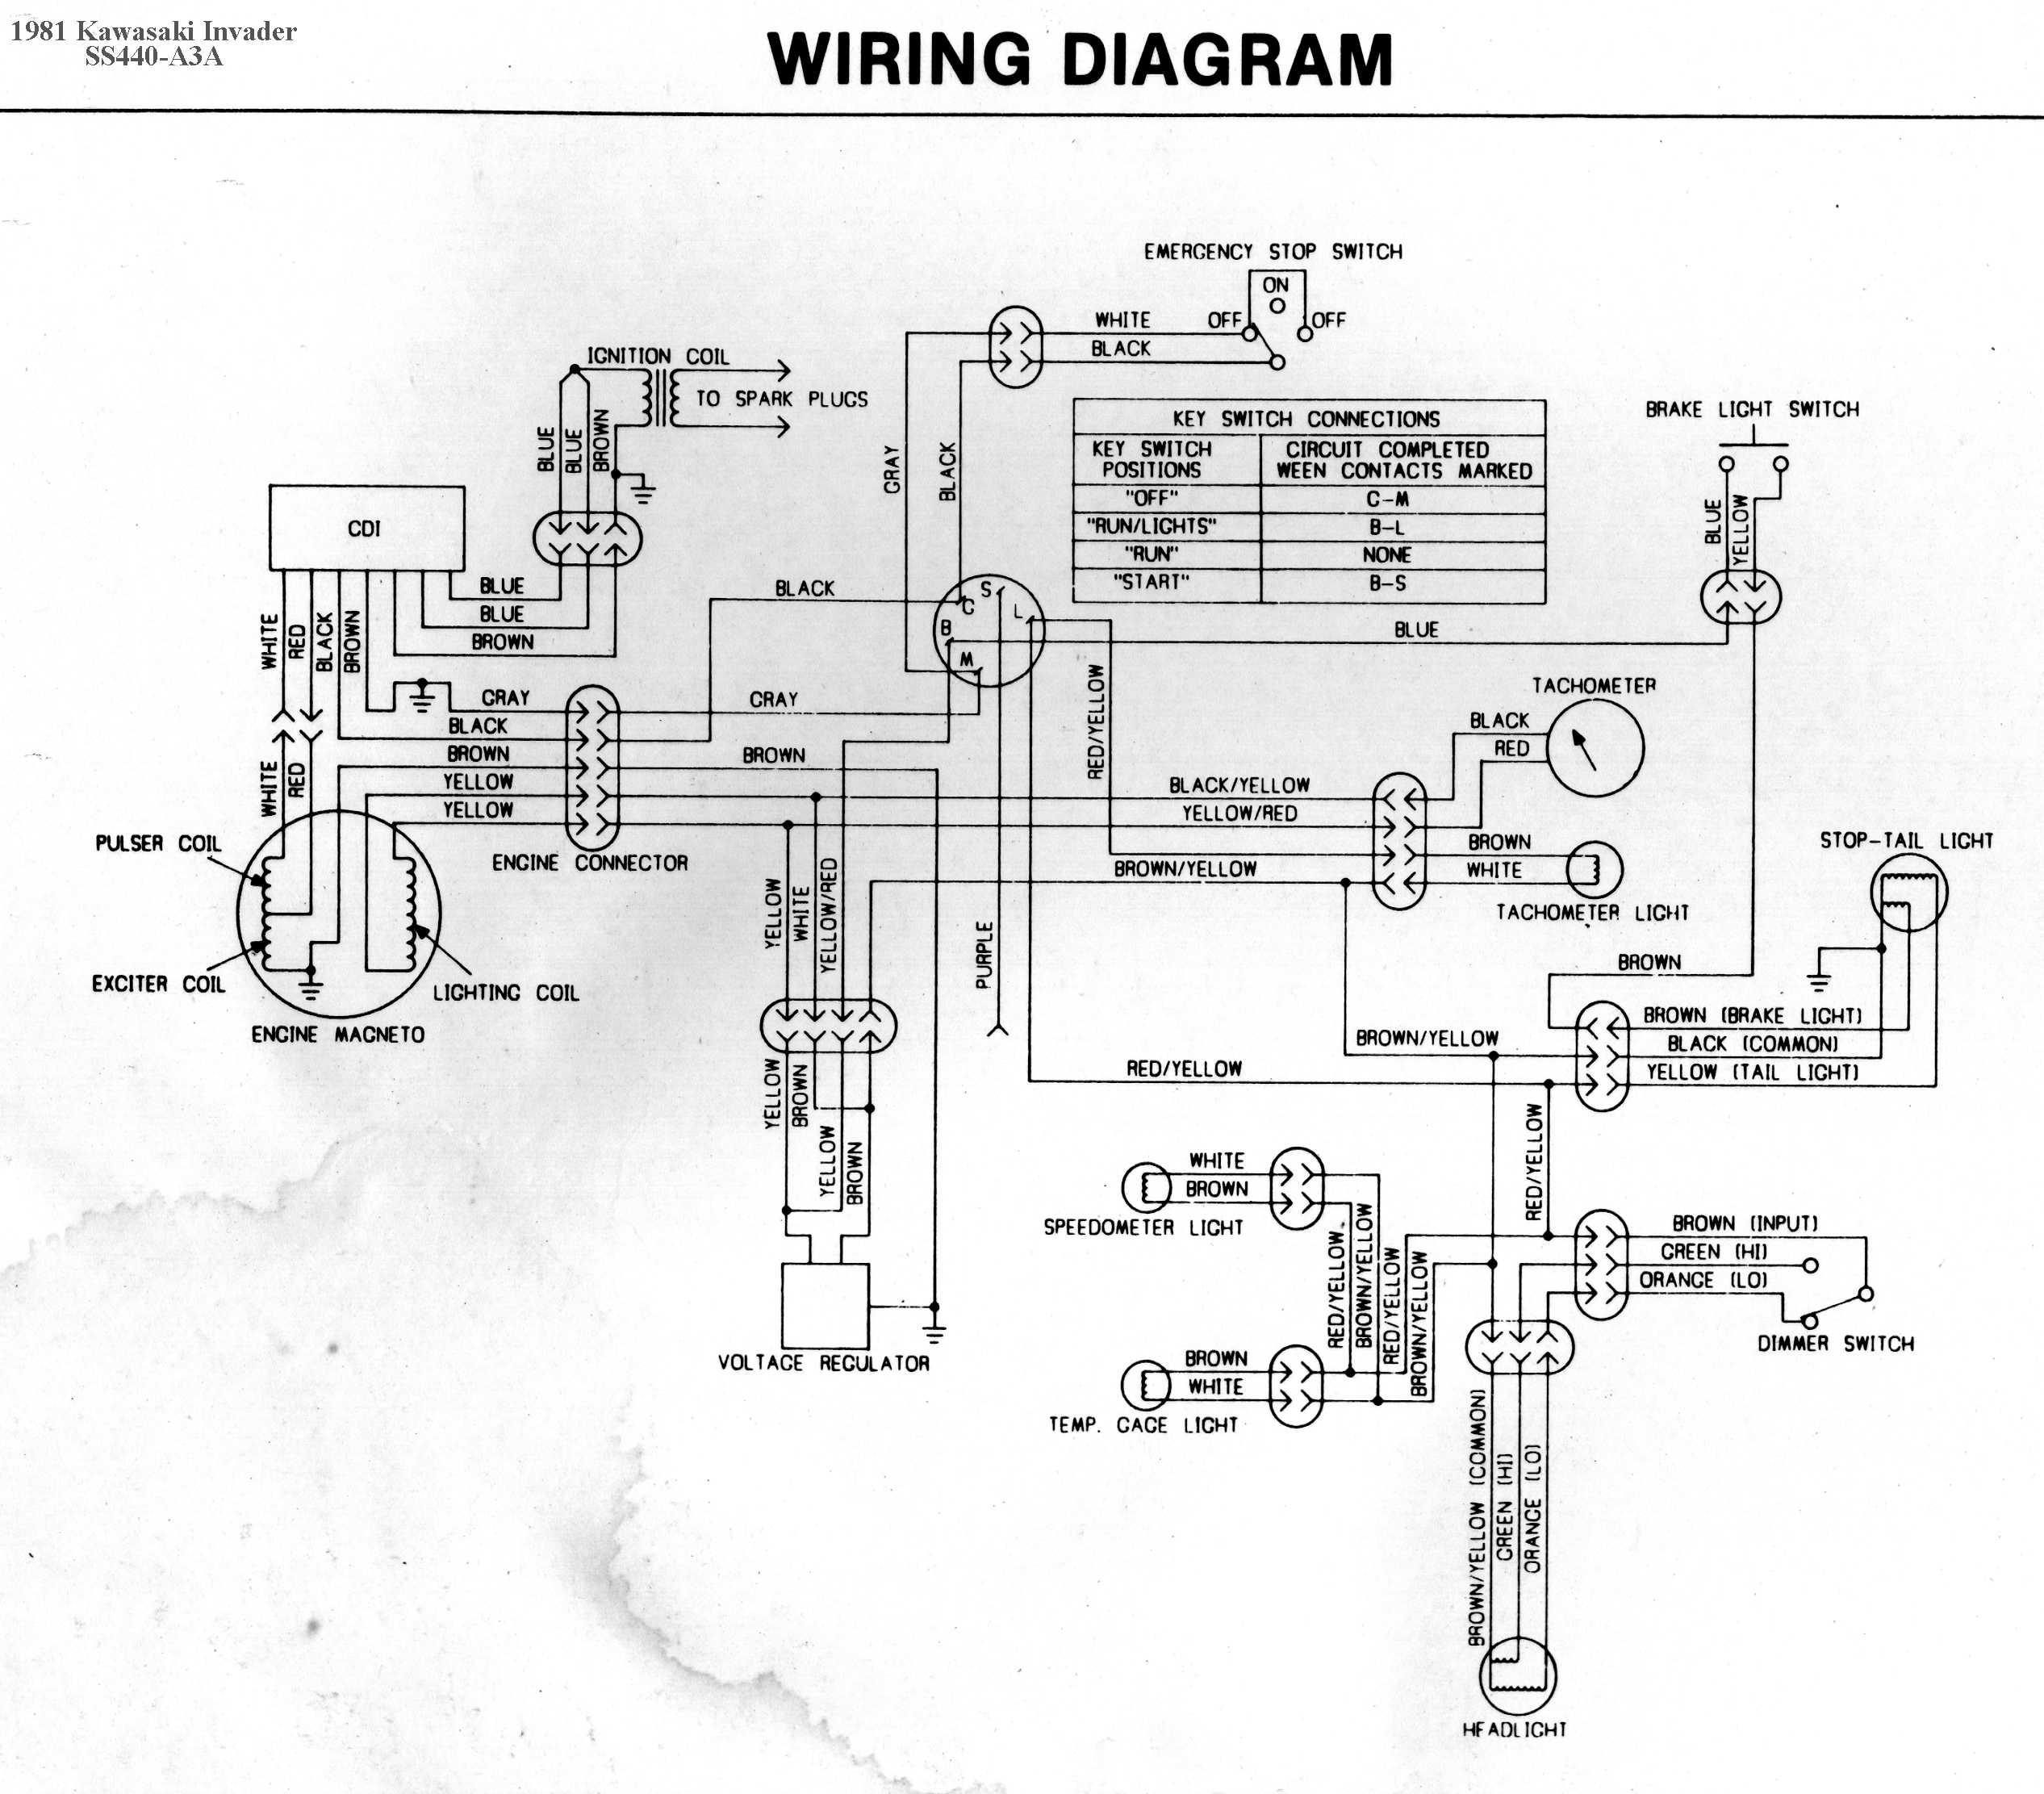 Wiring Diagram Schematic Kawasaki